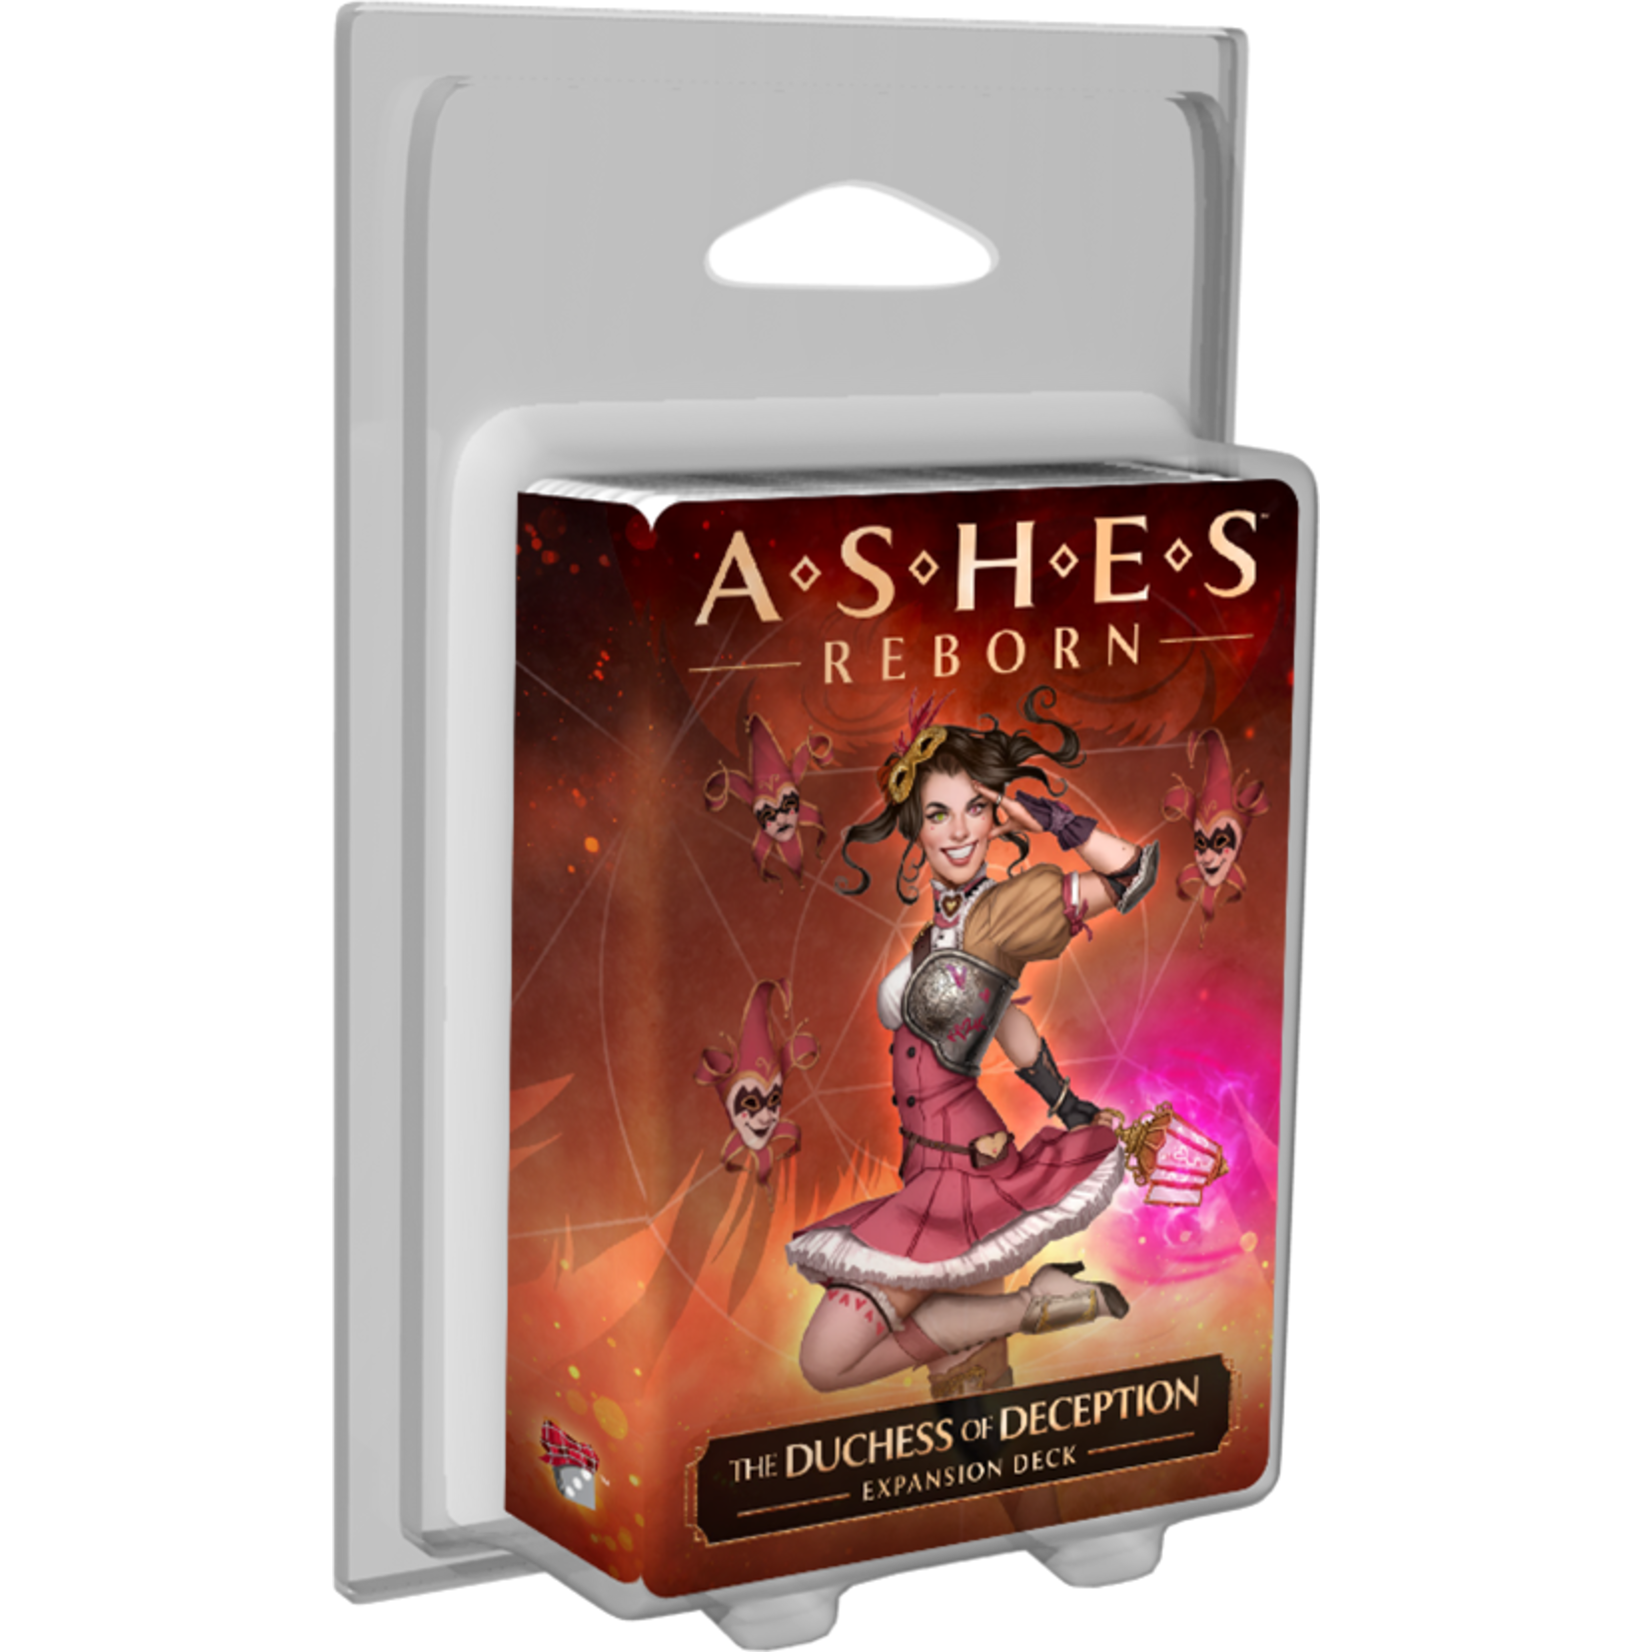 Plaid Hat Games Ashes: Reborn - The Duchess of Deception Expansion Deck